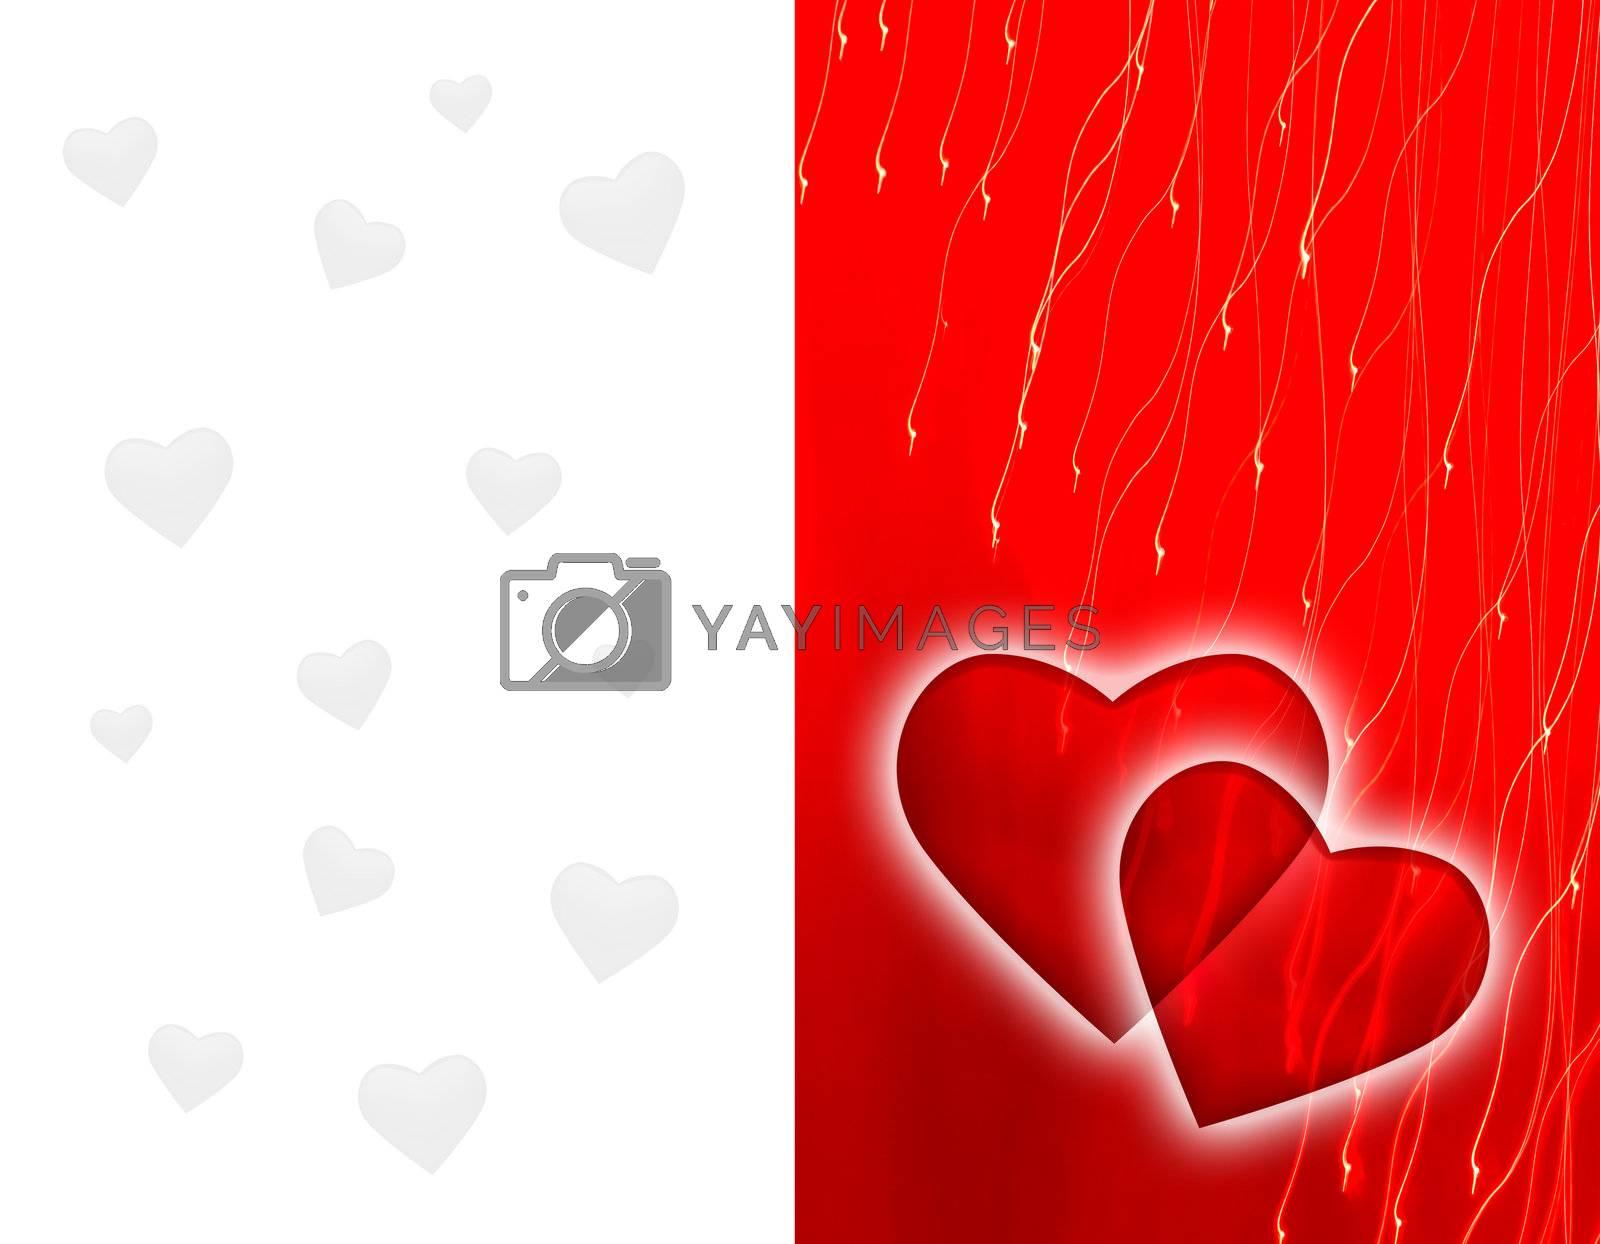 Royalty free image of St. Valentine Day's background. by wojciechkozlowski